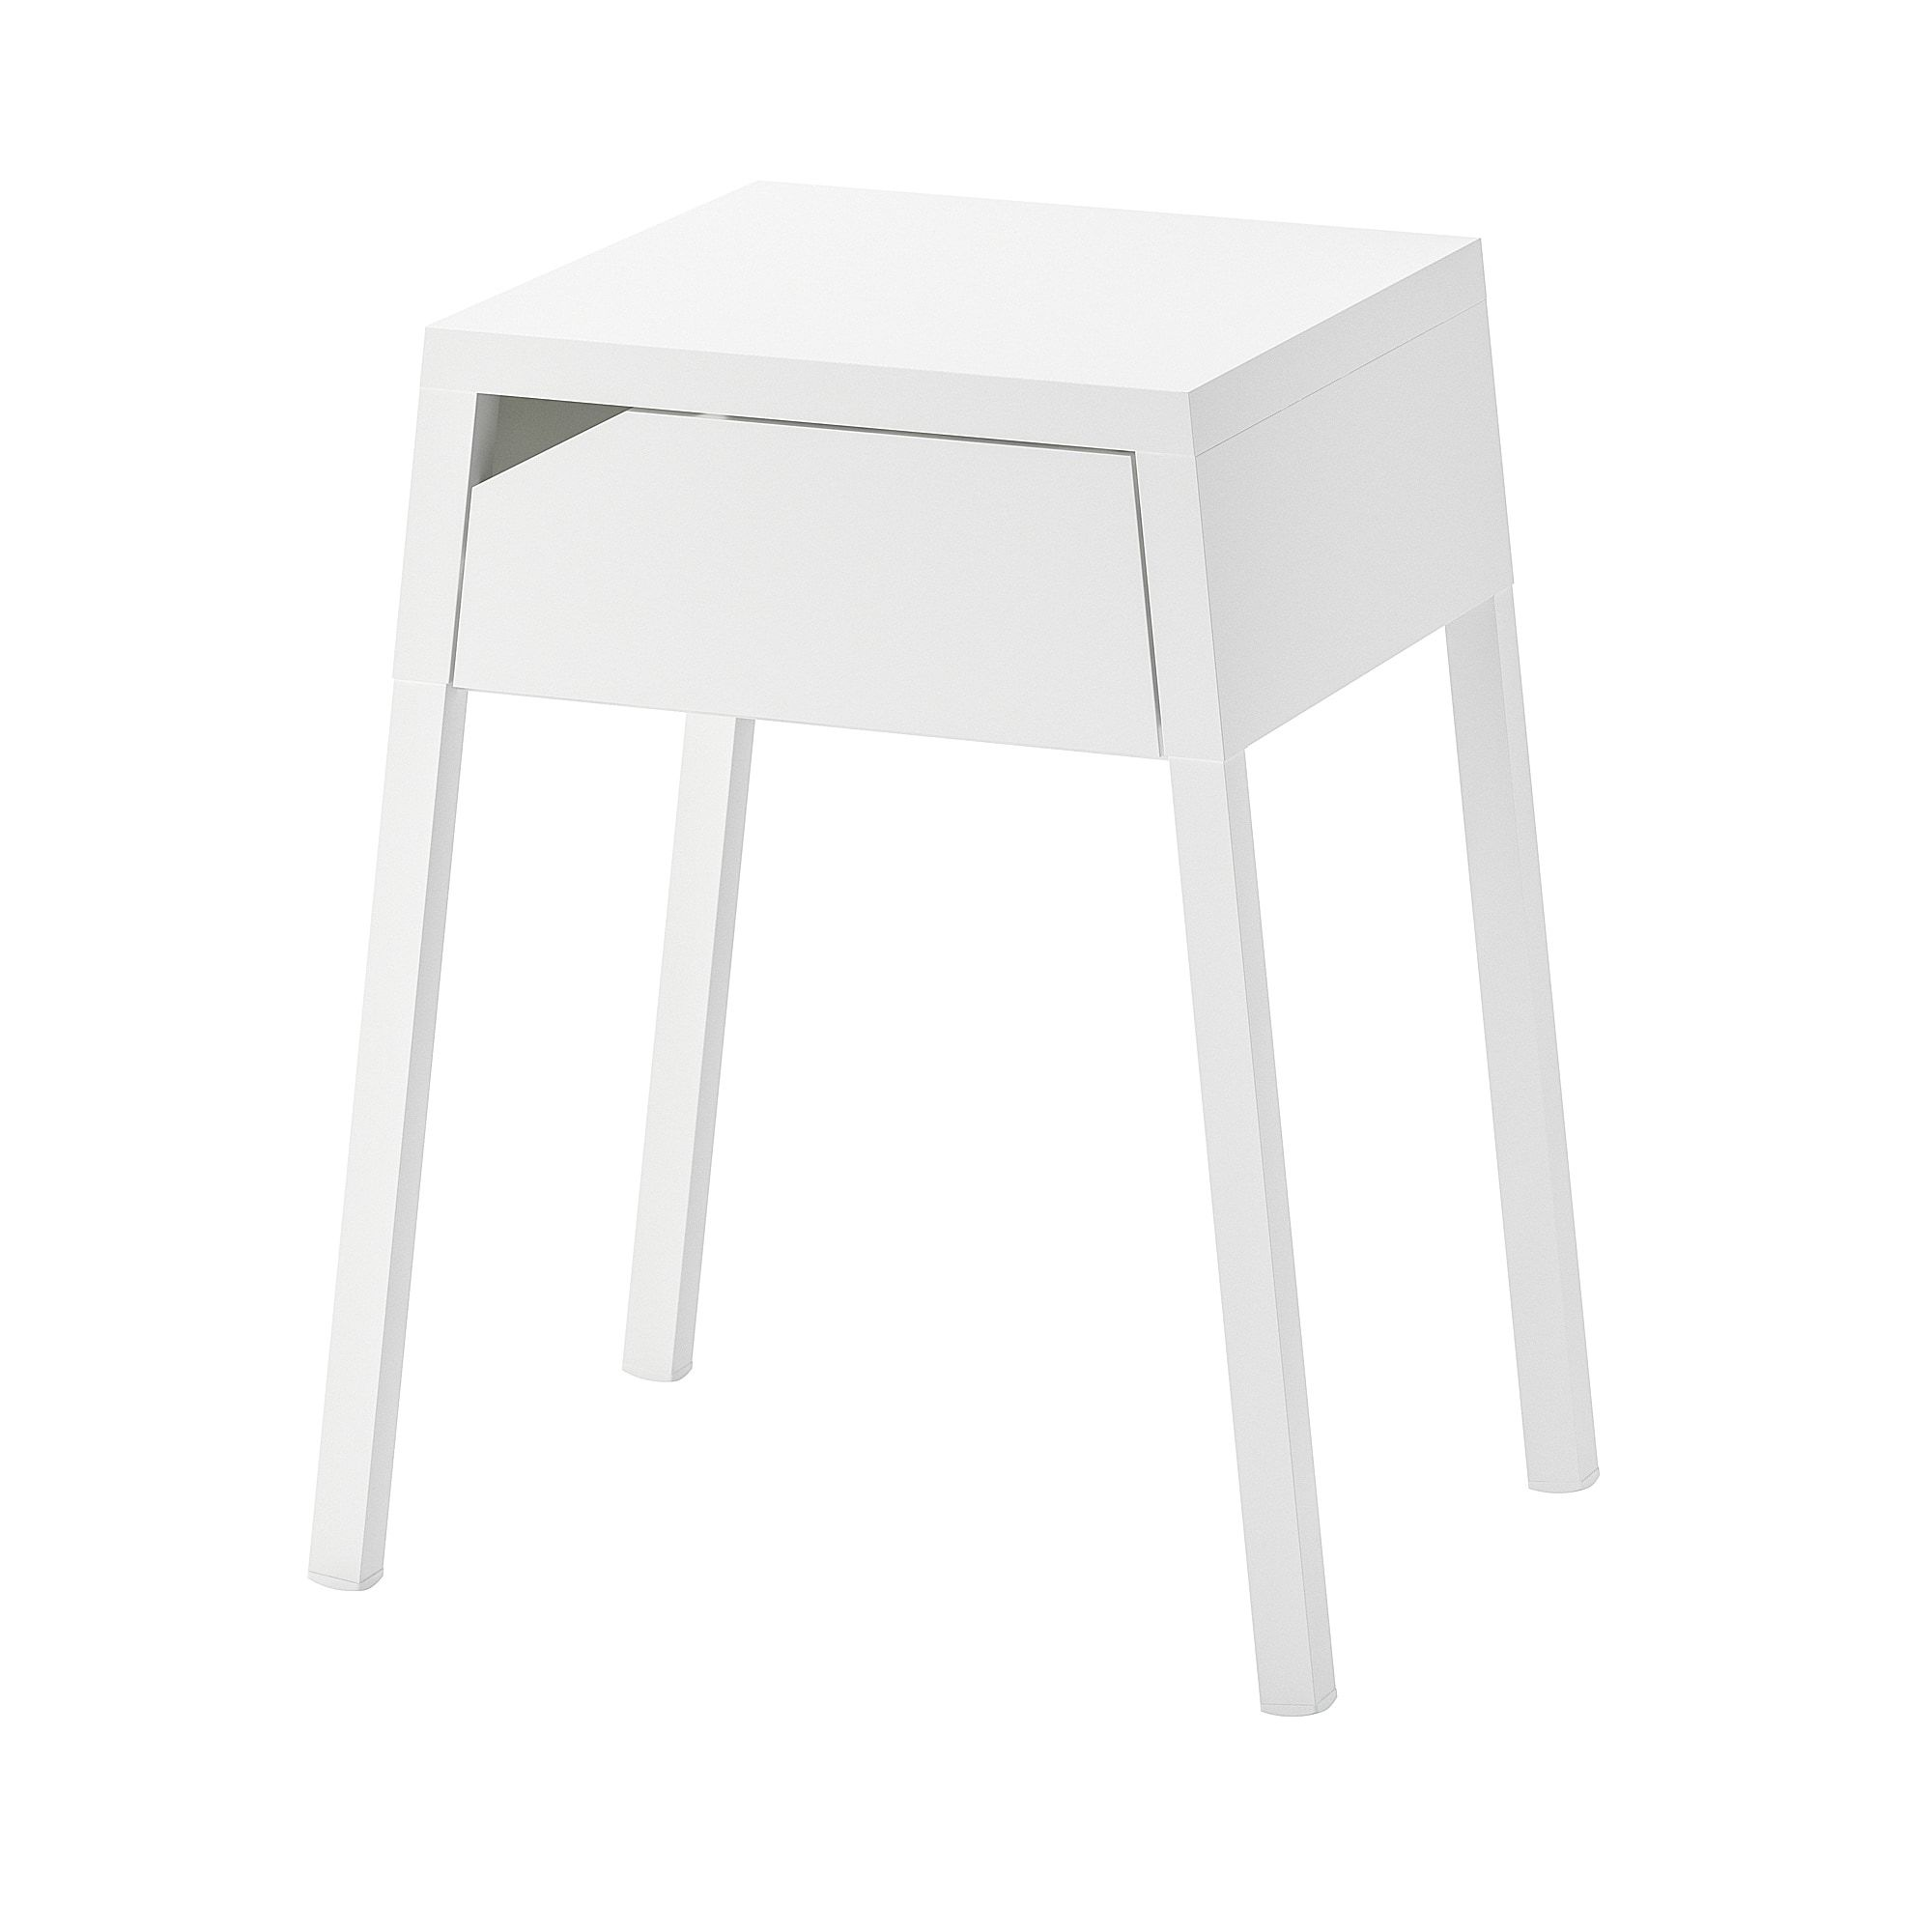 Ikea Us Furniture And Home Furnishings Selje White Bedside Table Ikea